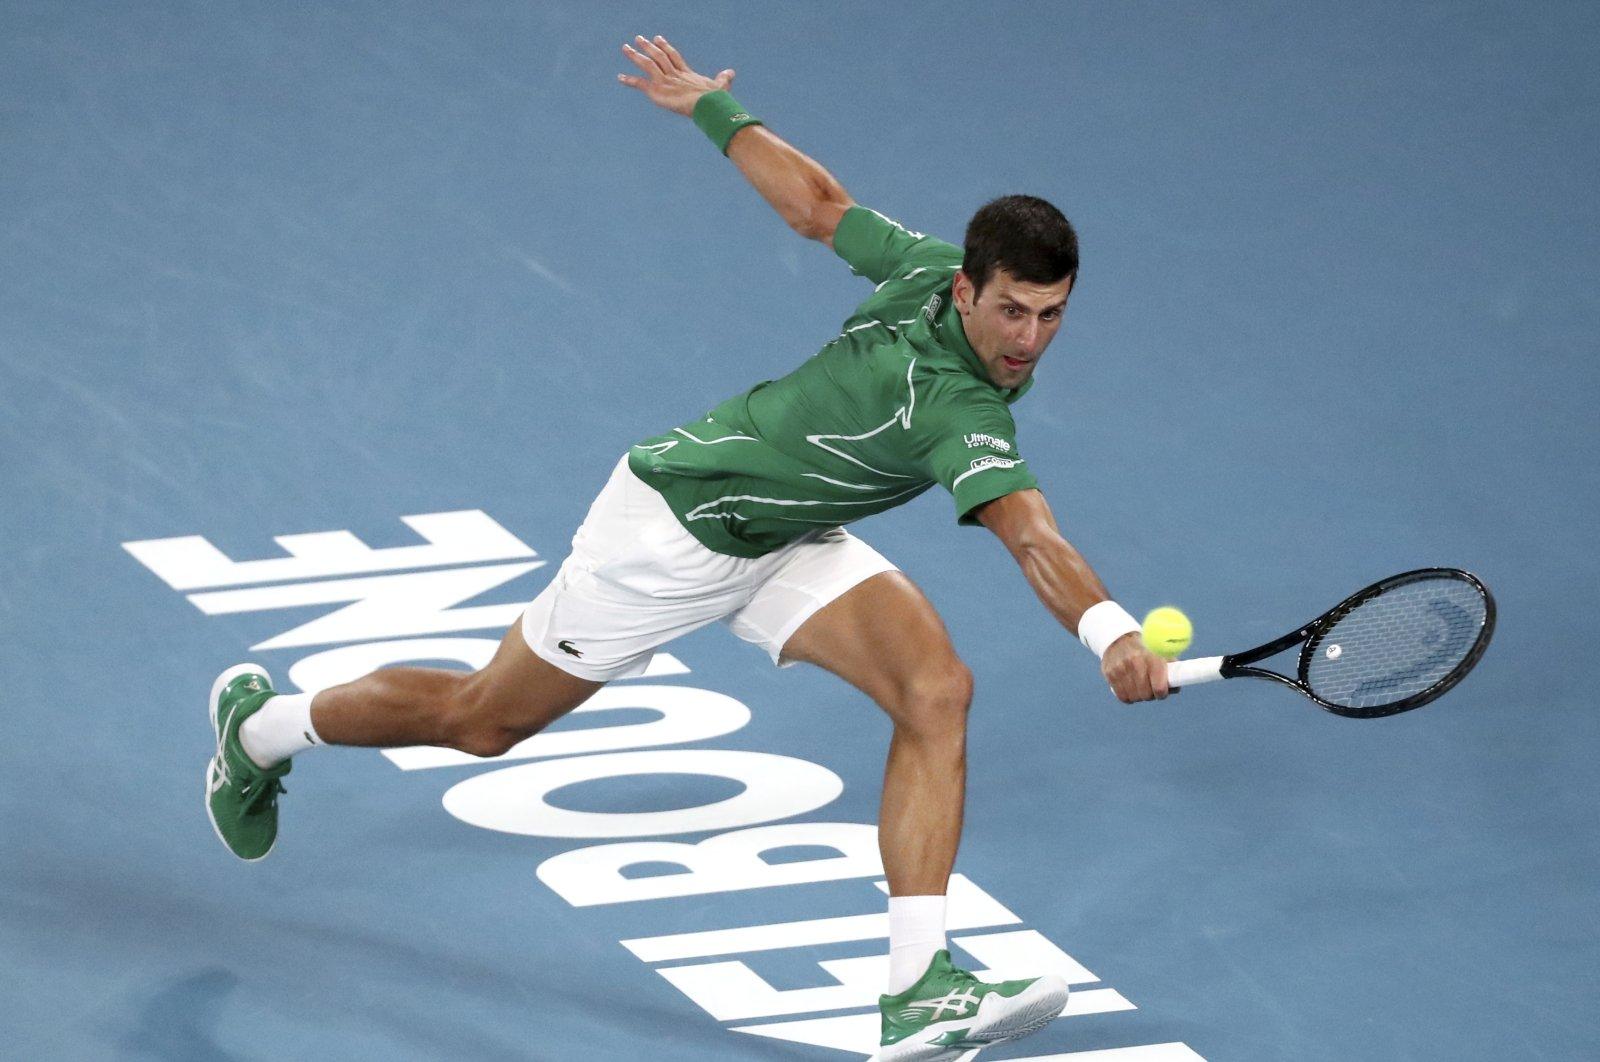 Novak Djokovic makes a backhand return to Dominic Thiem during the Australian Open final in Melbourne, Australia, Feb. 2, 2020. (AP Photo)